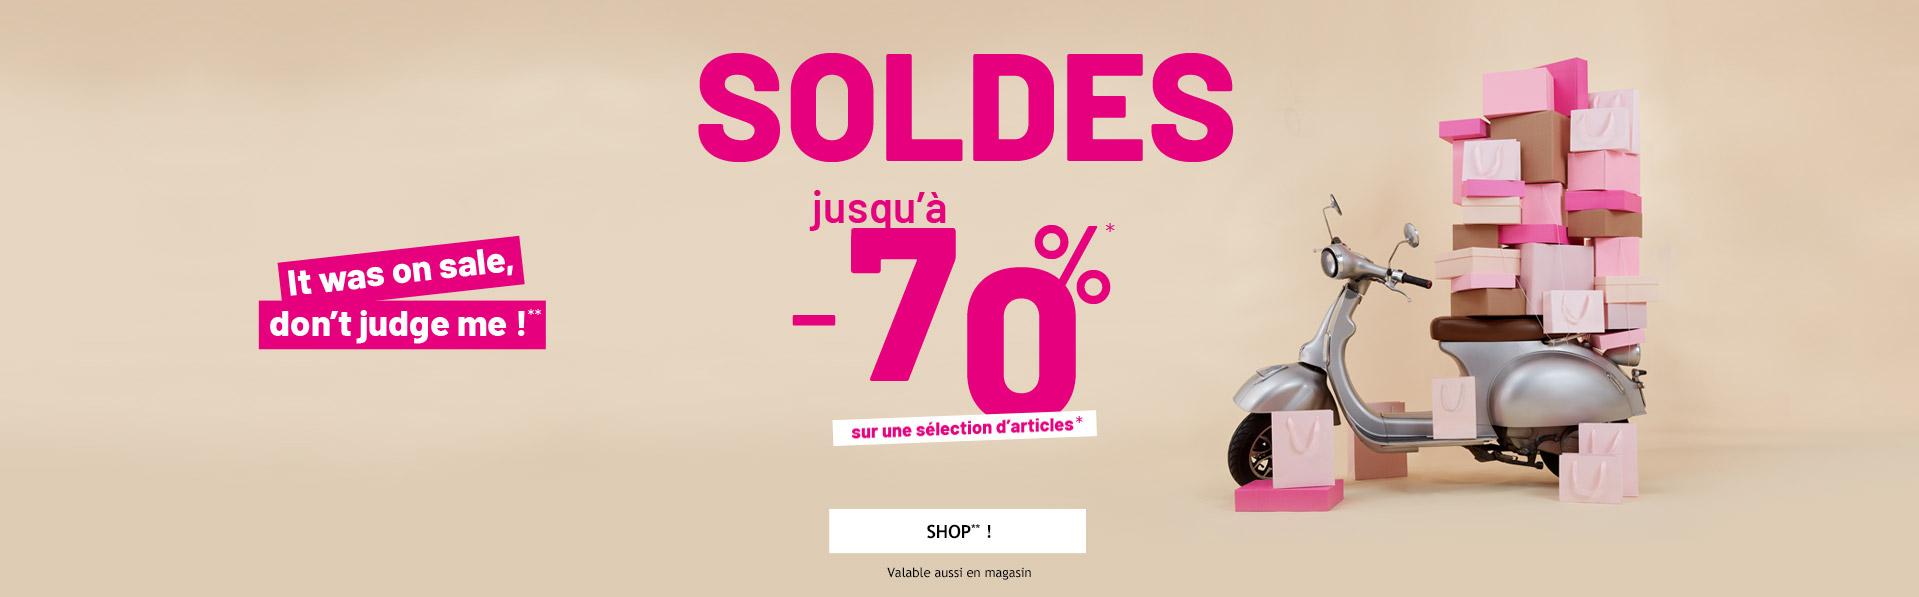 sales**